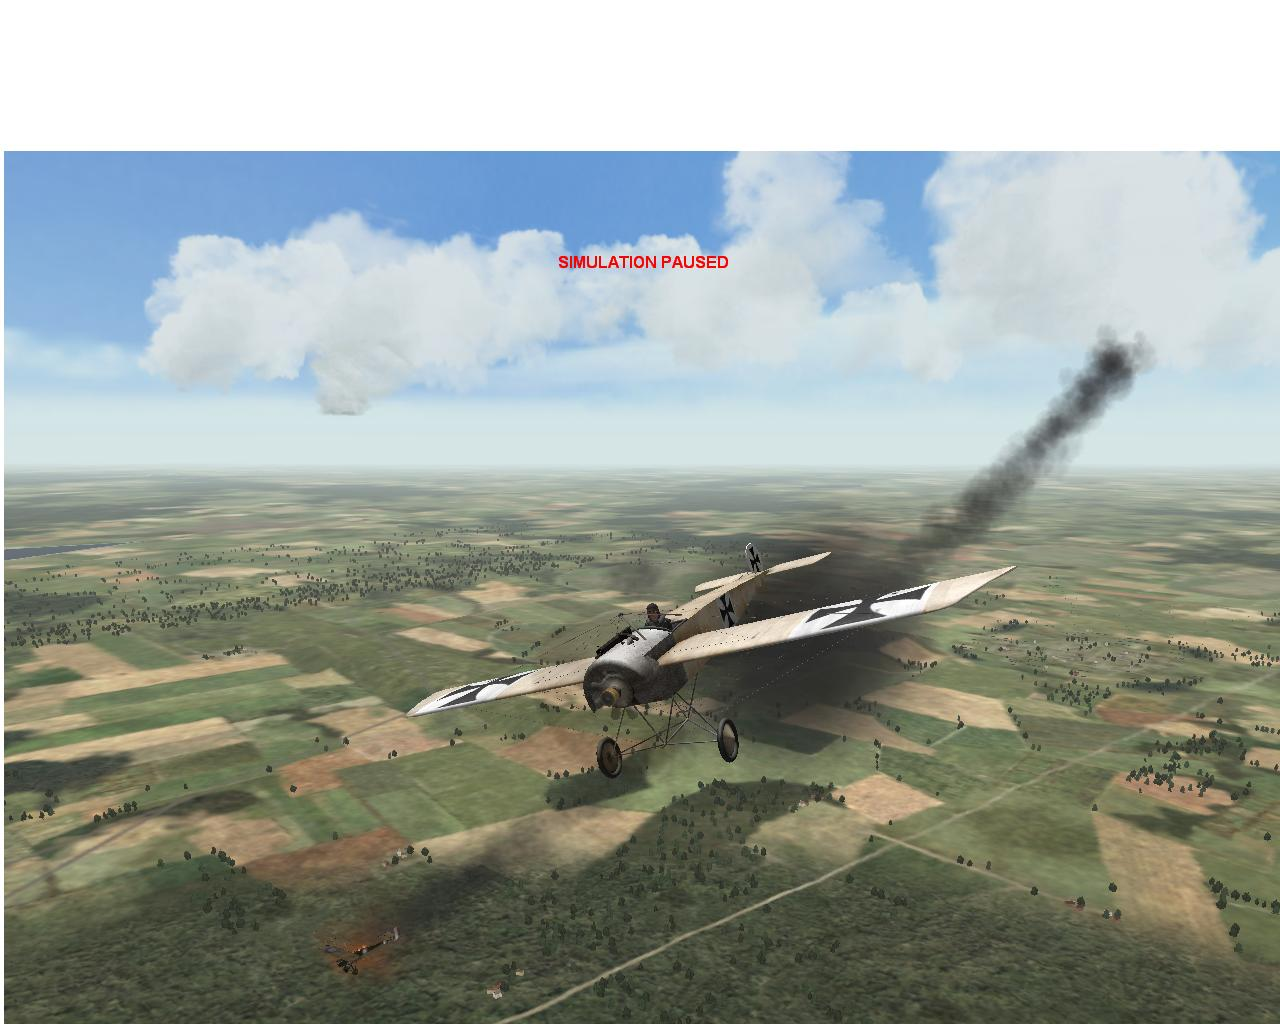 E-3.JPG